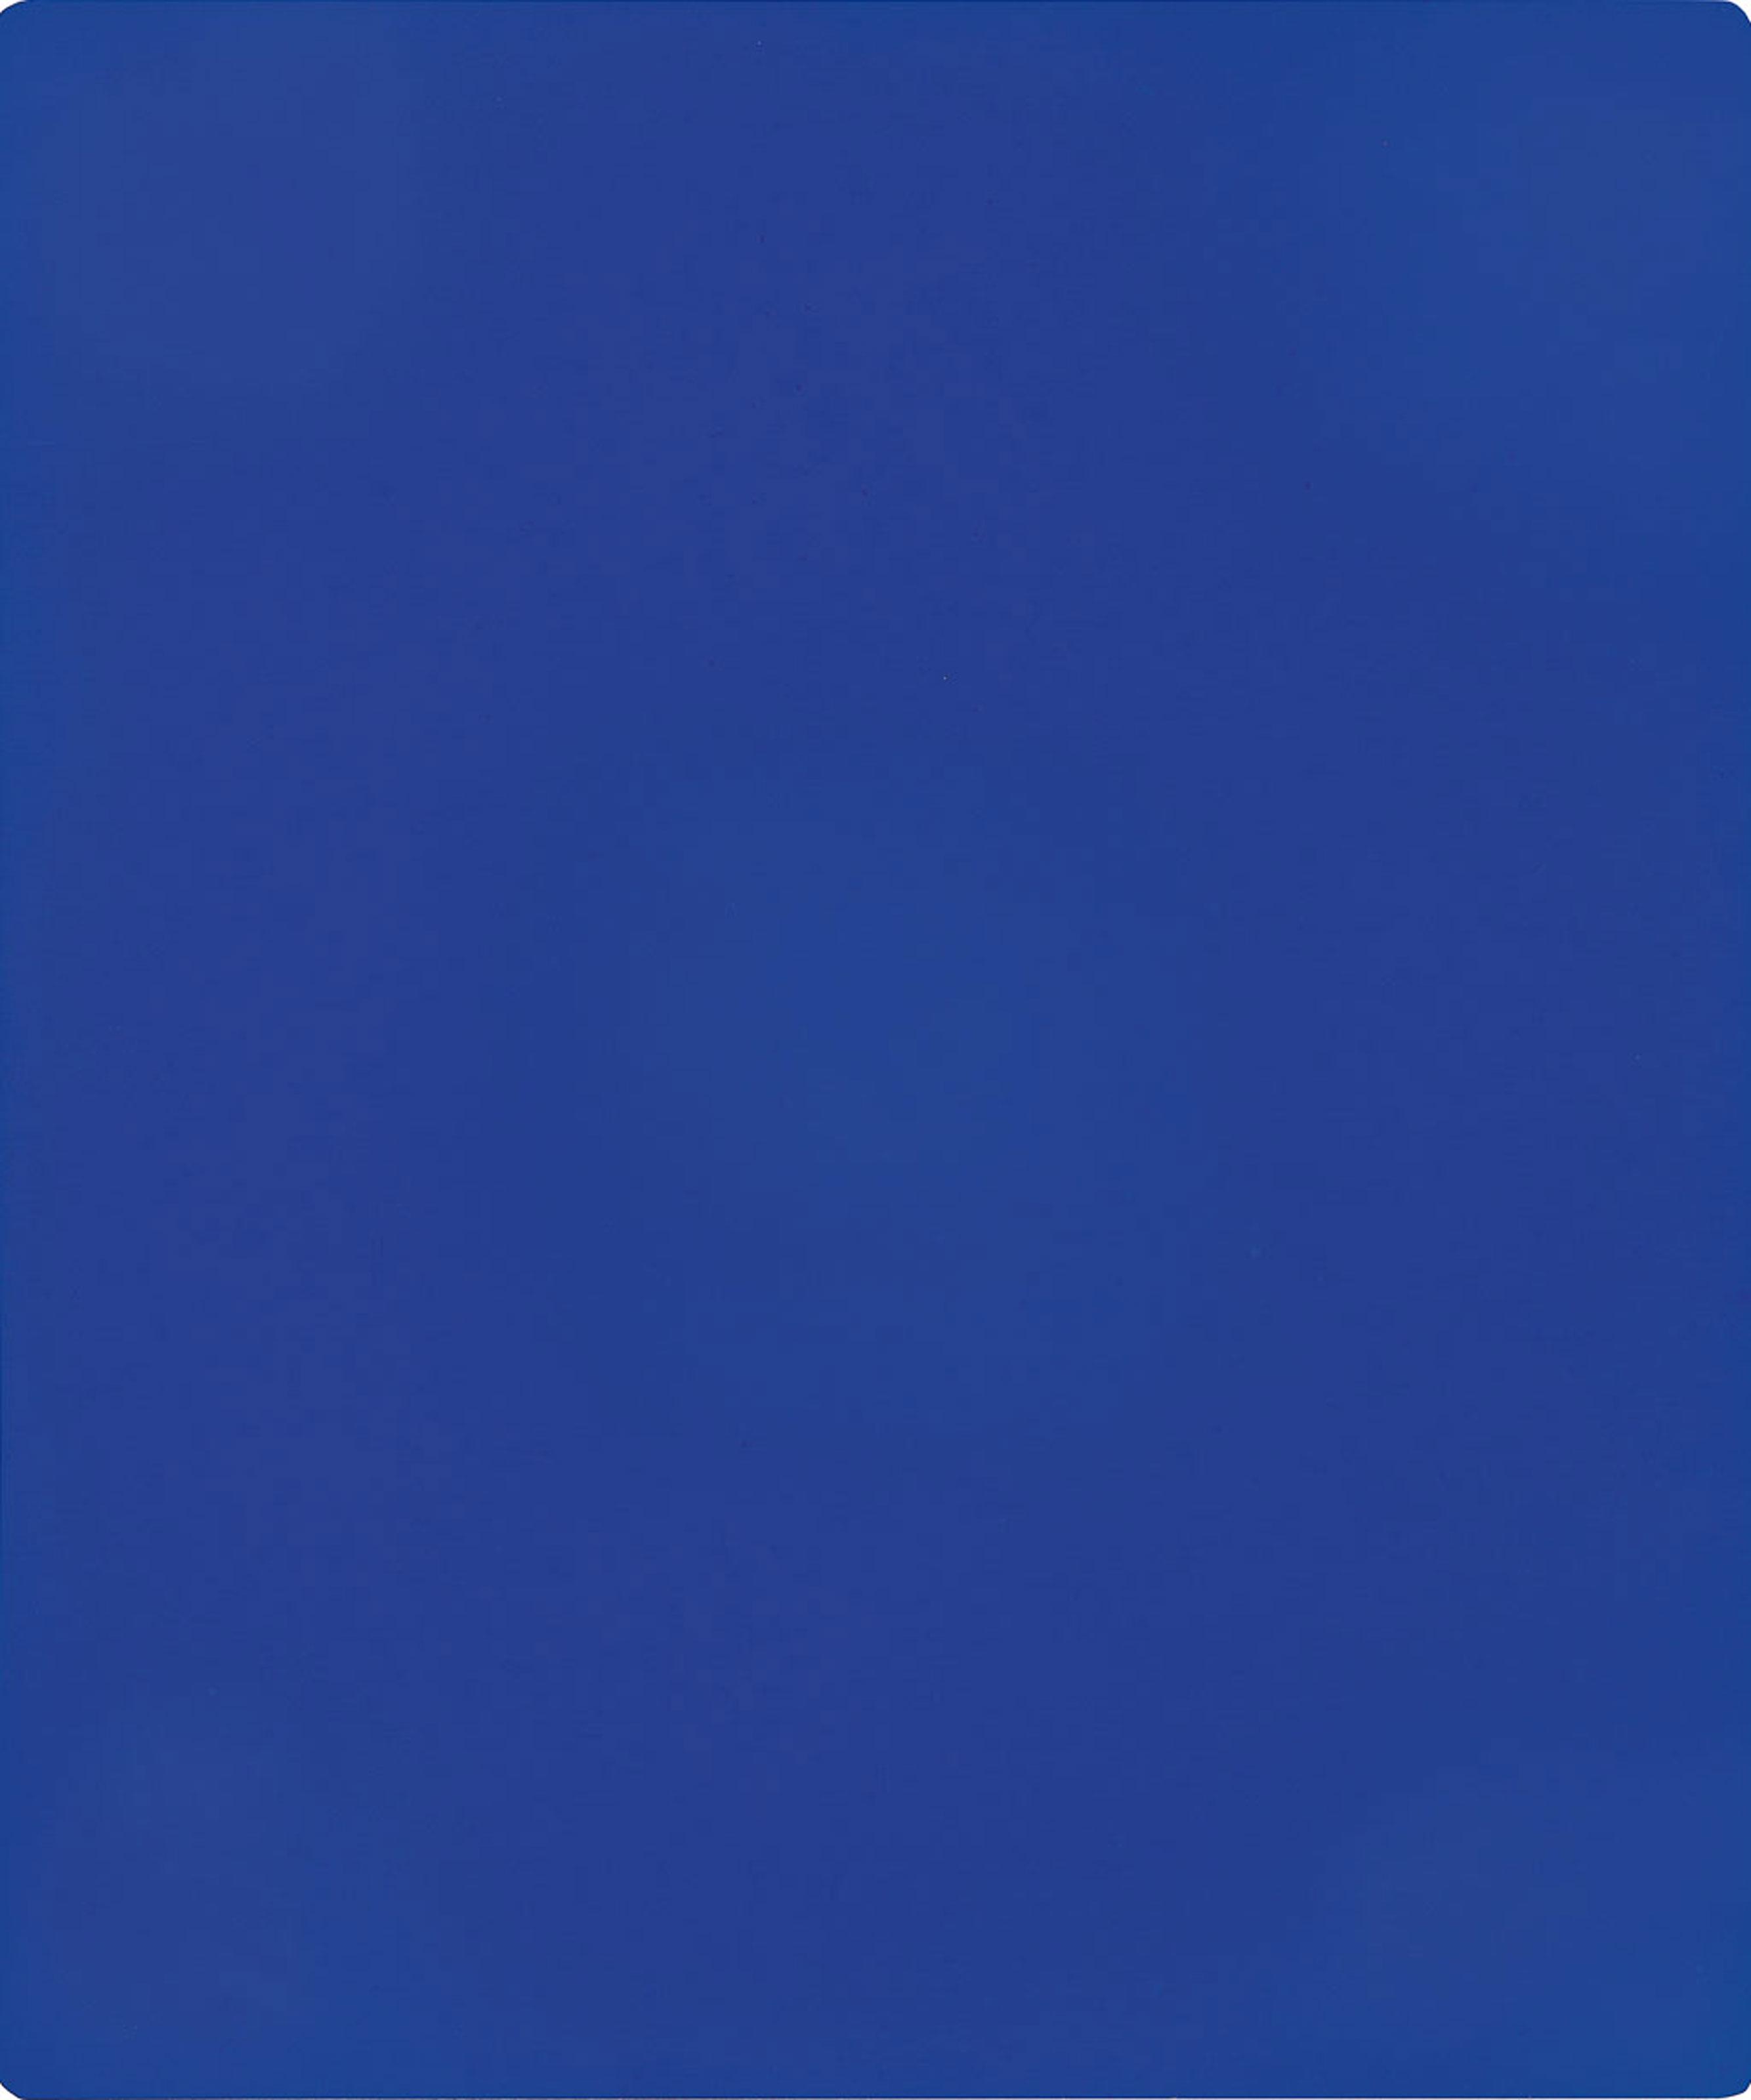 yves klein french 1928 1962 monochrome bleu sans. Black Bedroom Furniture Sets. Home Design Ideas